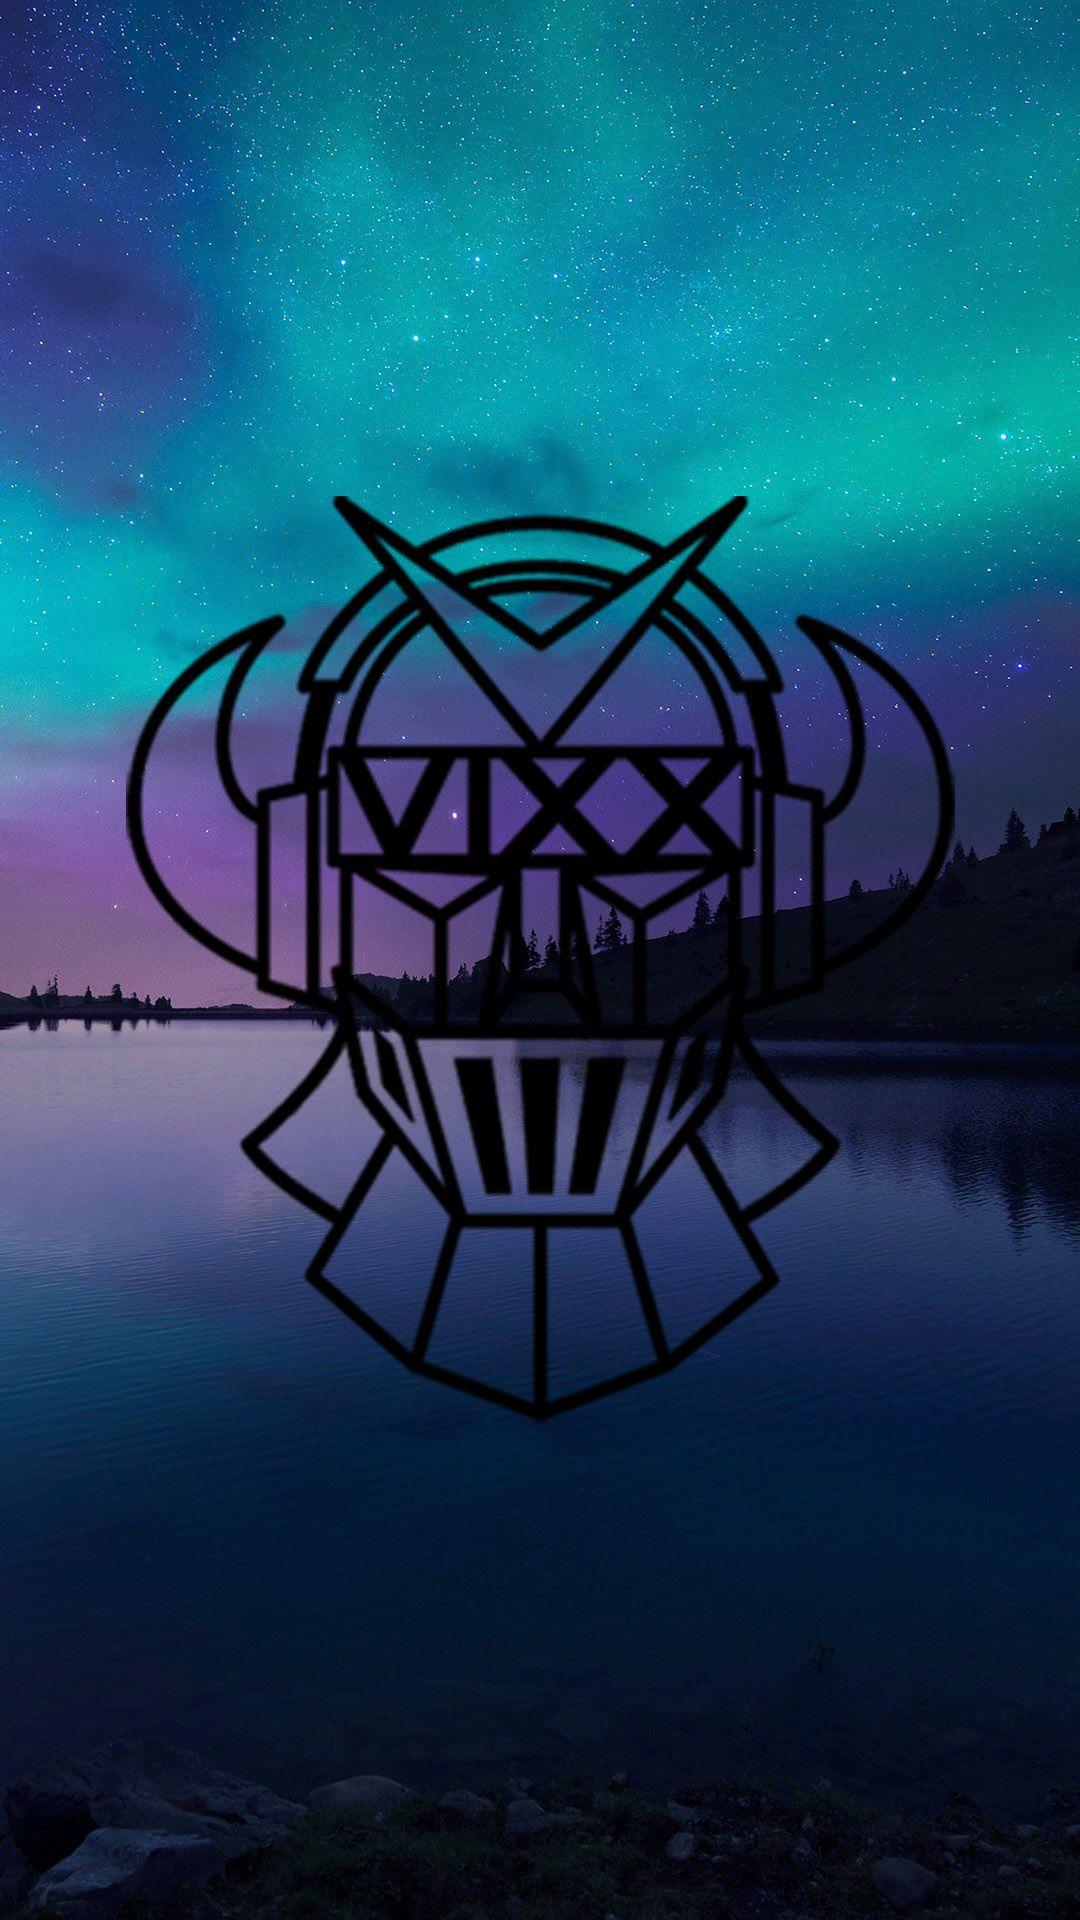 Vixx Logo Wallpaper #VIXX #KPOP #WALLPAPER...